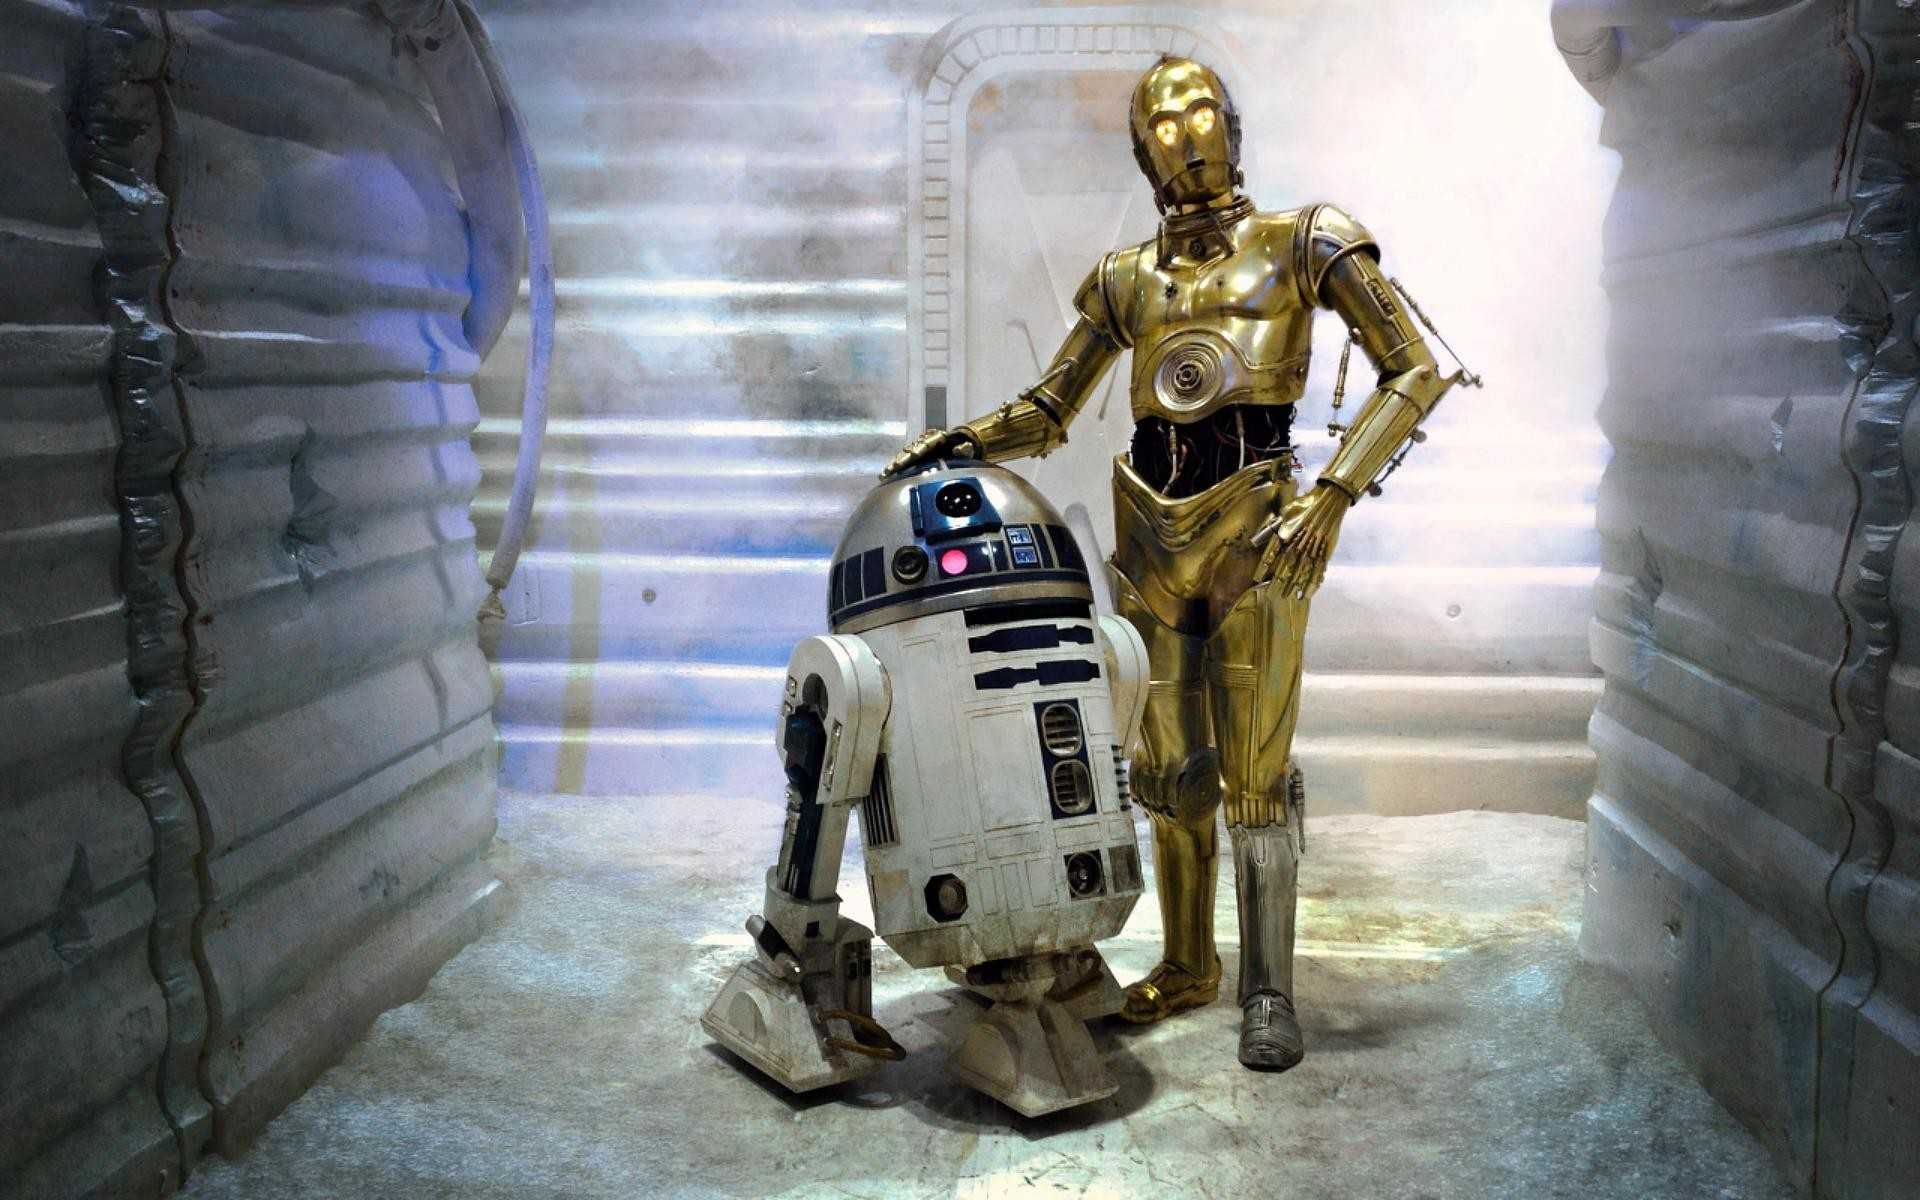 1920x1200 R2 D2 C 3PO Best Friends Wallpaper